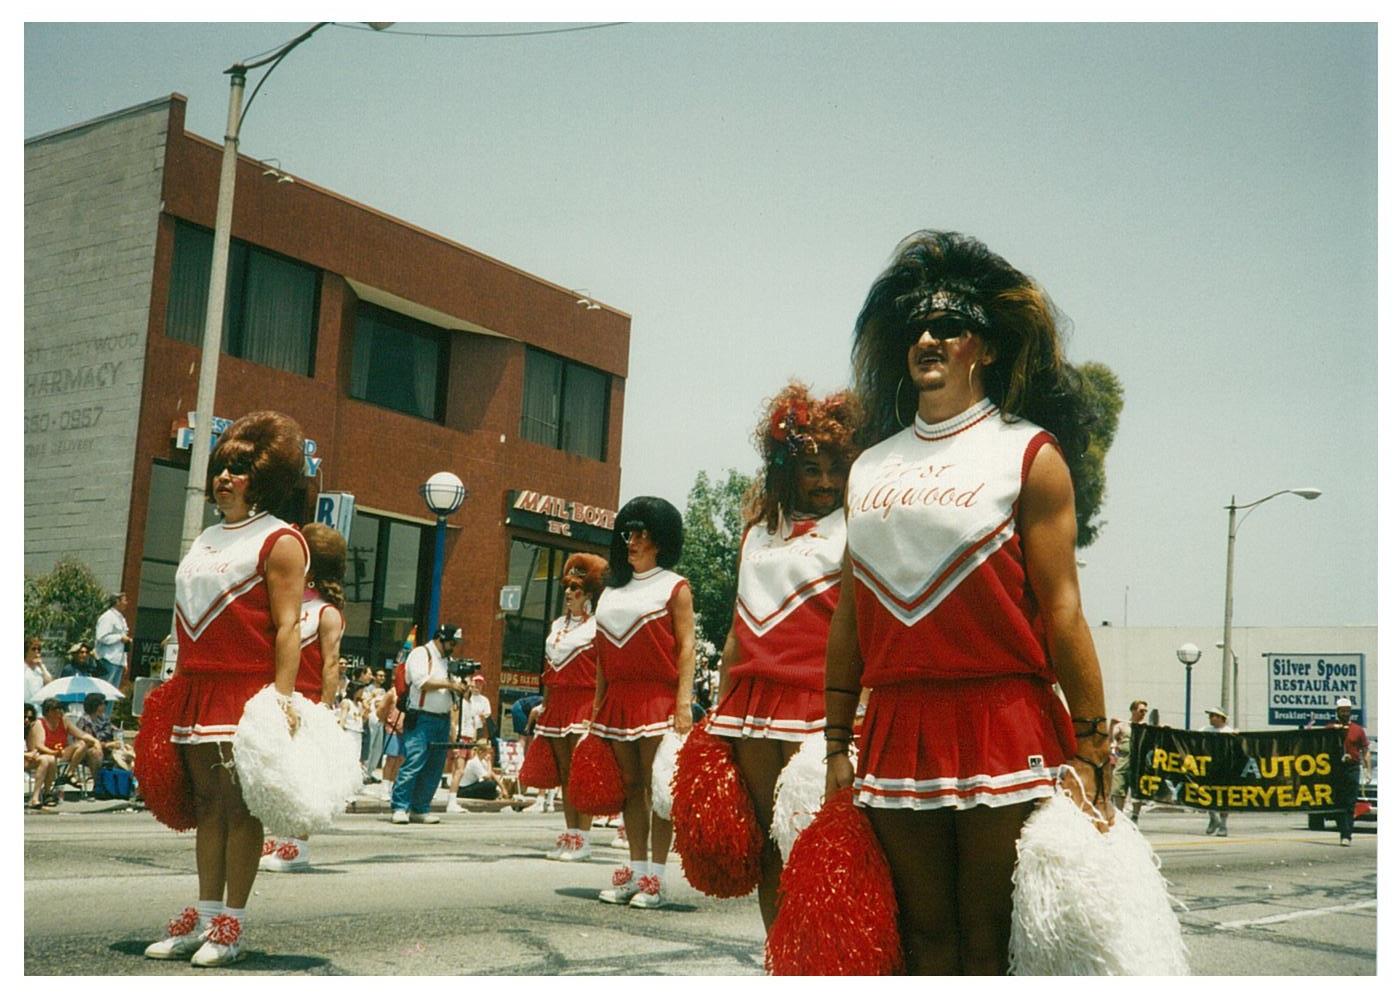 West Hollywood Cheerleaders   Ambassadors of Goodwill